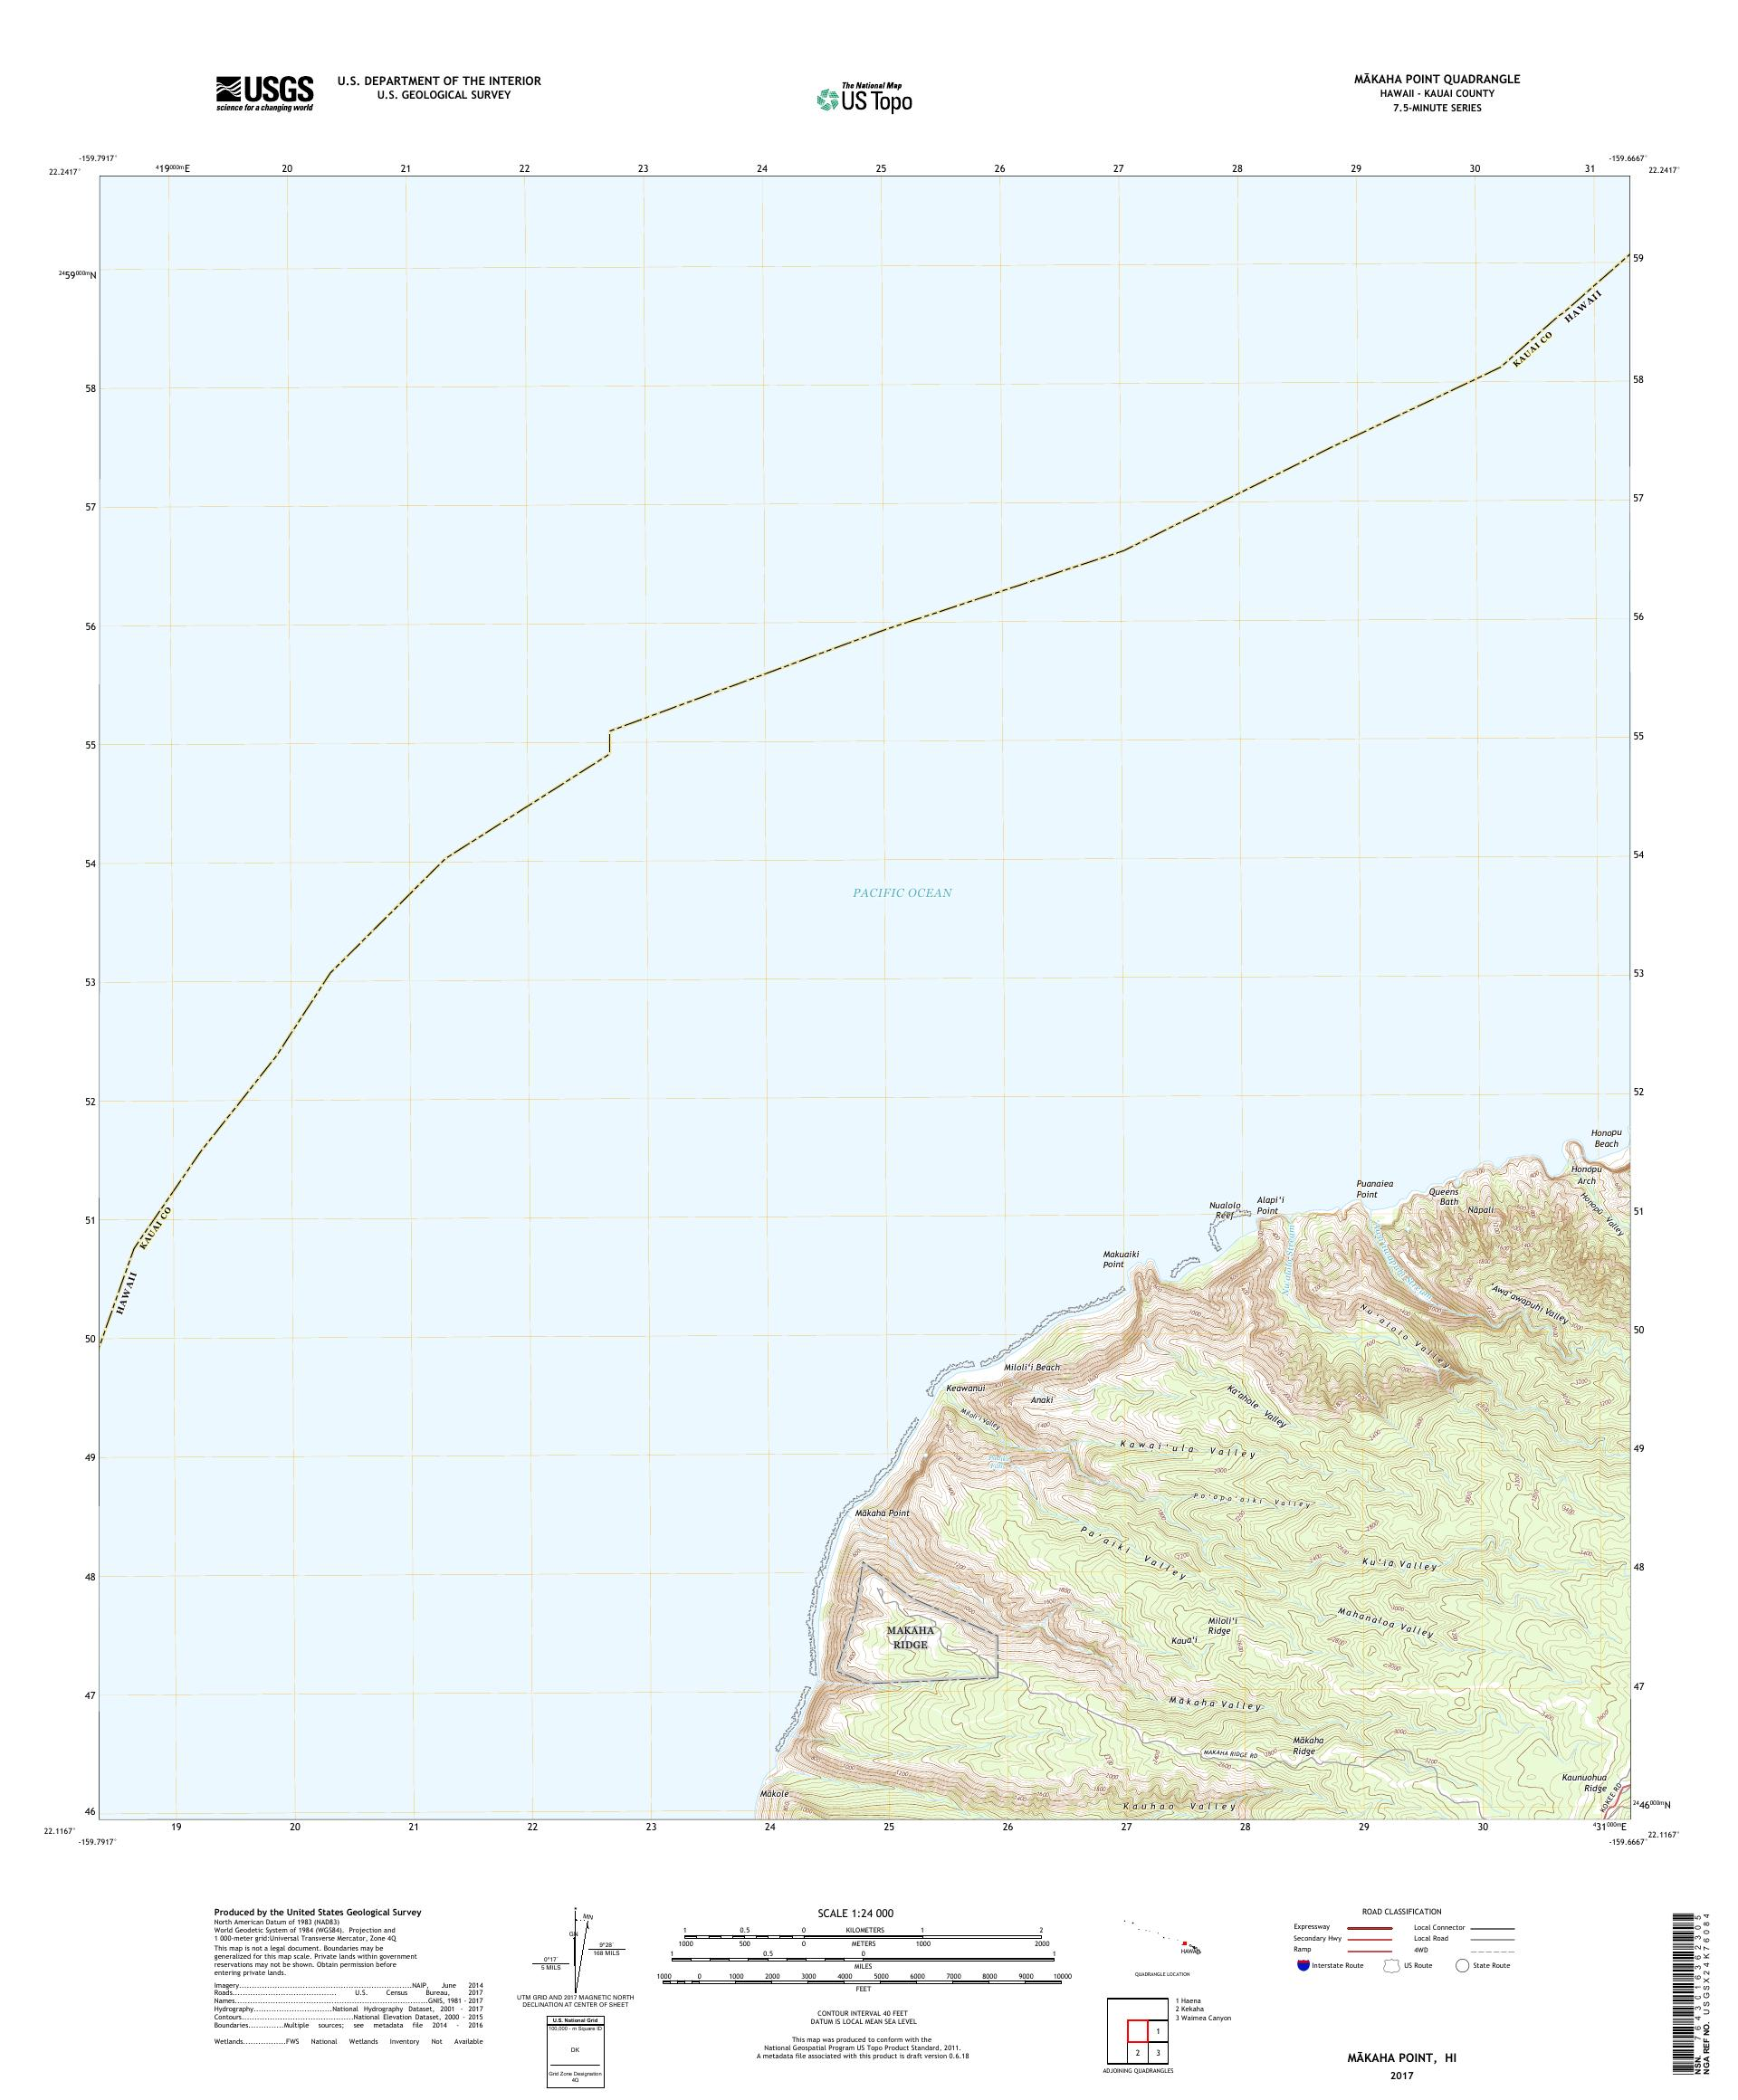 MyTopo Makaha Point, Hawaii USGS Quad Topo Map on honolulu neighborhood map, honolulu county map, pahoa map, kapaa map, kaha lani map, laie map, hawaiian paradise park map, north kohala map, lanikai map, waianae map, kahala map, sunset map, waipahu map, makawao map, mililani map, honolulu bus route map, hawaiian beaches map, pauoa valley map, punaluu map, aina haina map,